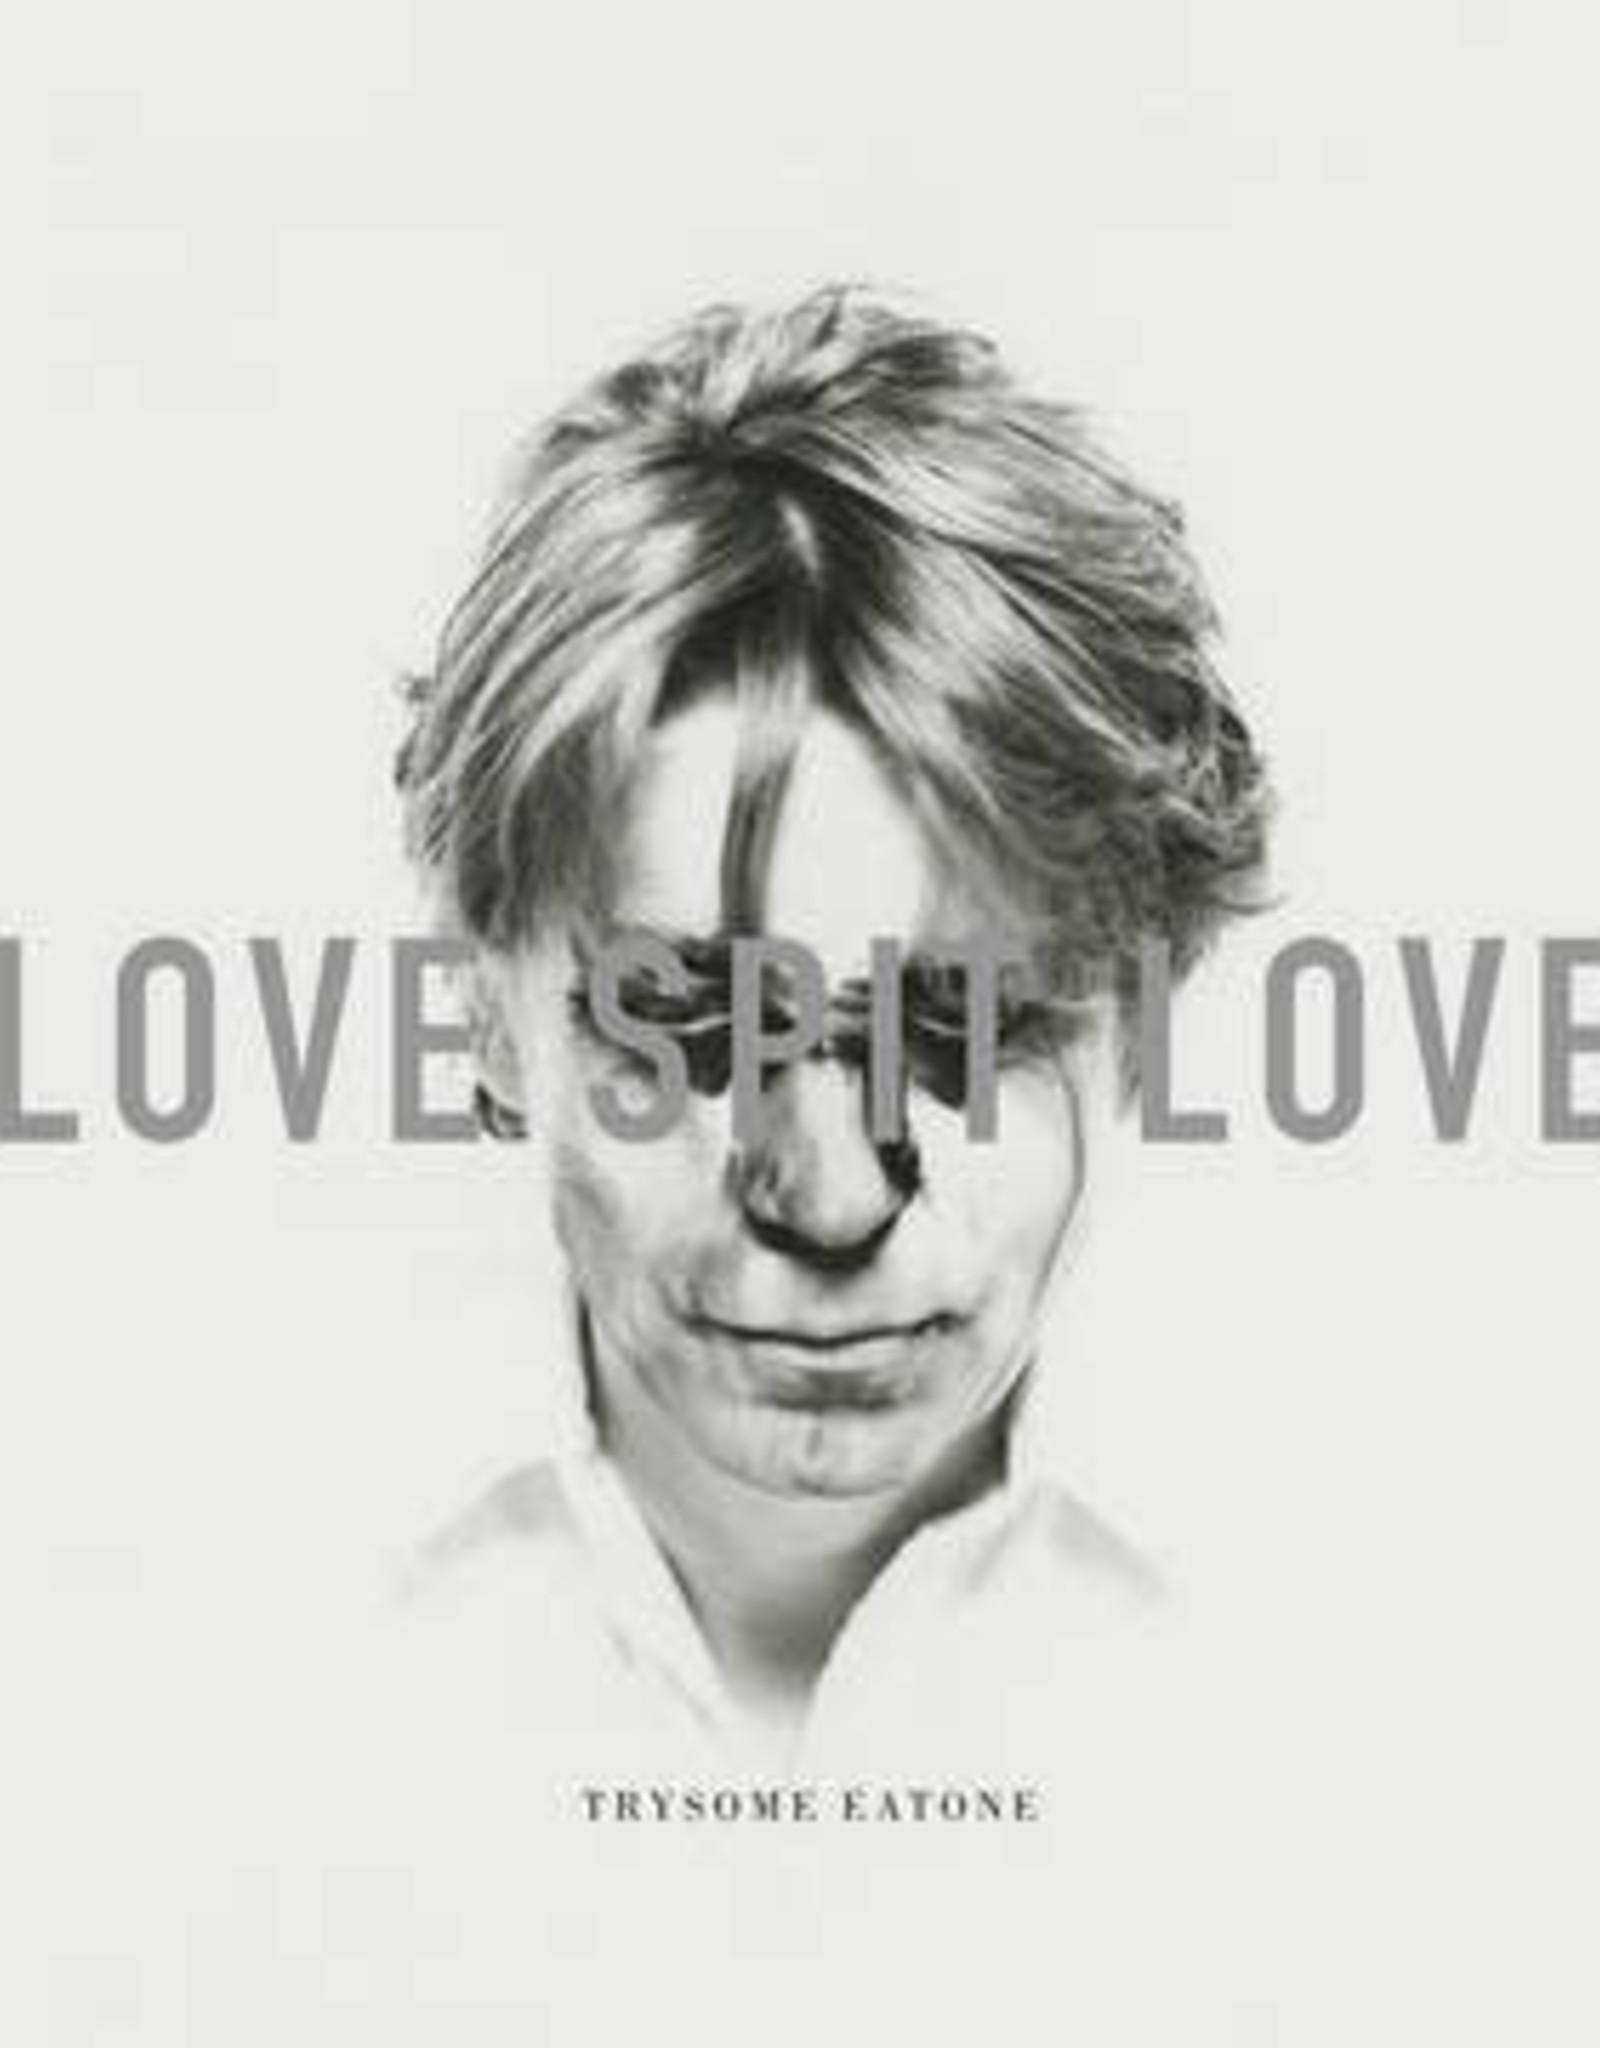 Love Spit Love - Trysome Eatone (Swirl Vinyl)(RSD 6/21)